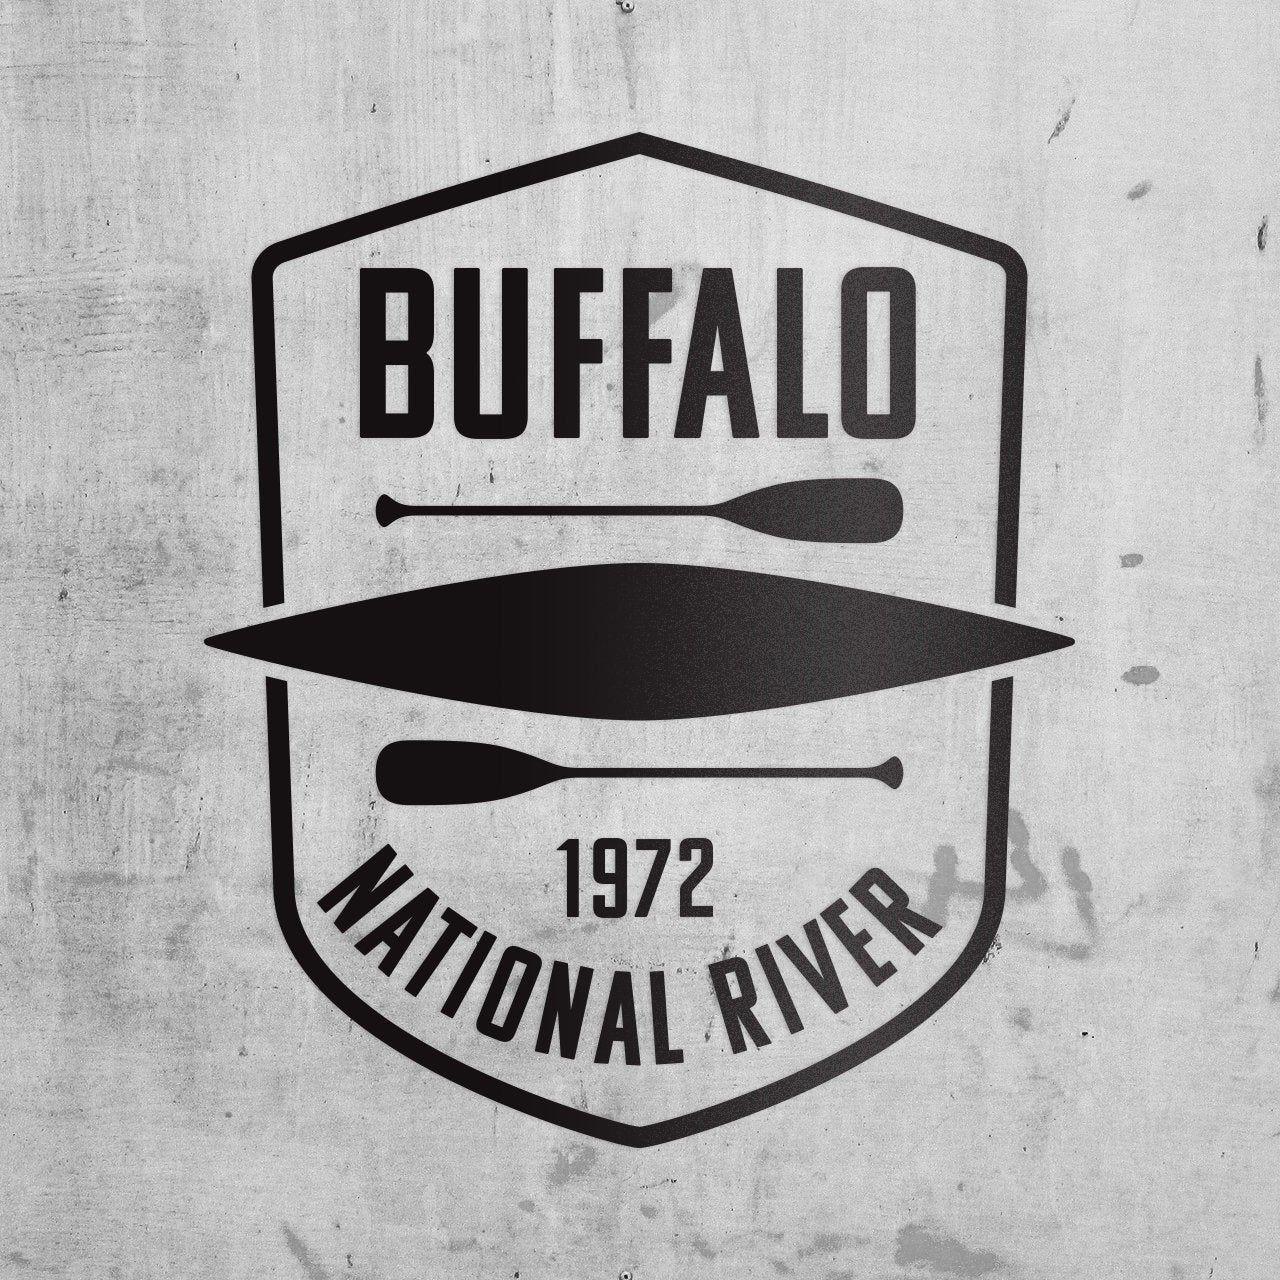 Buffalo National River Macbook Laptop Car Decal Etsy River Buffalo National [ 1280 x 1280 Pixel ]